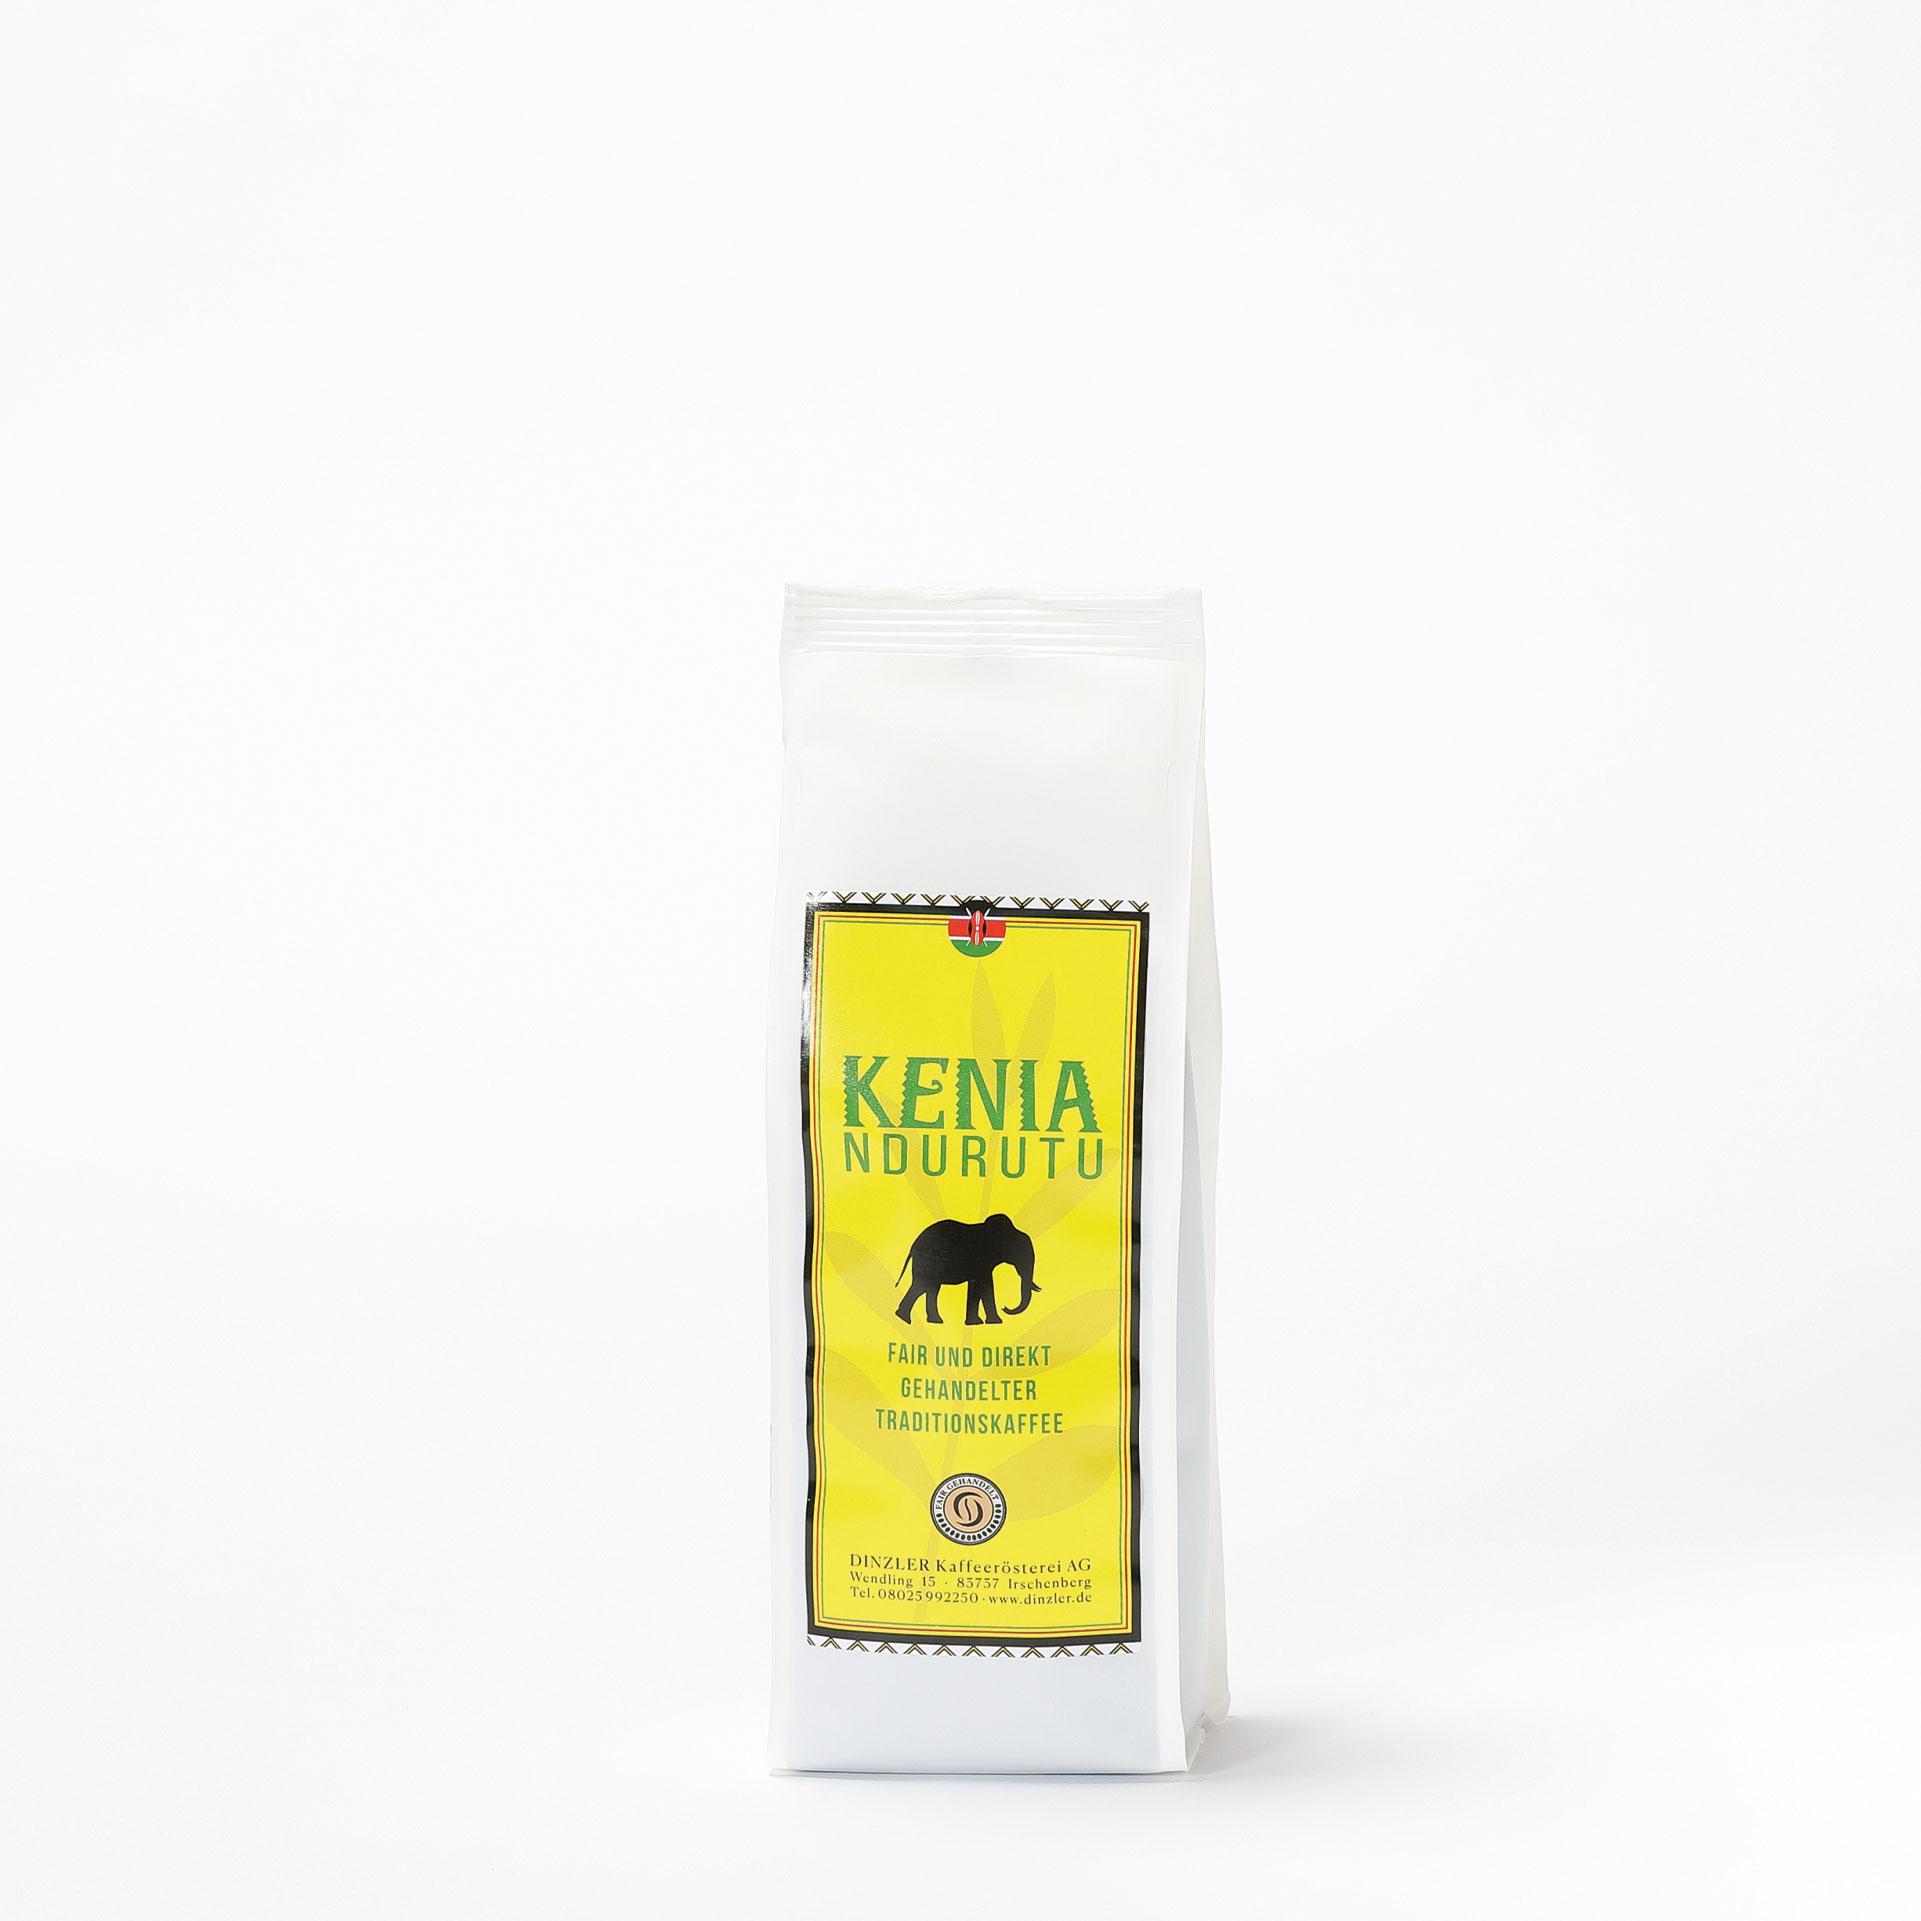 DINZLER Kaffee Kenia Ndurutu